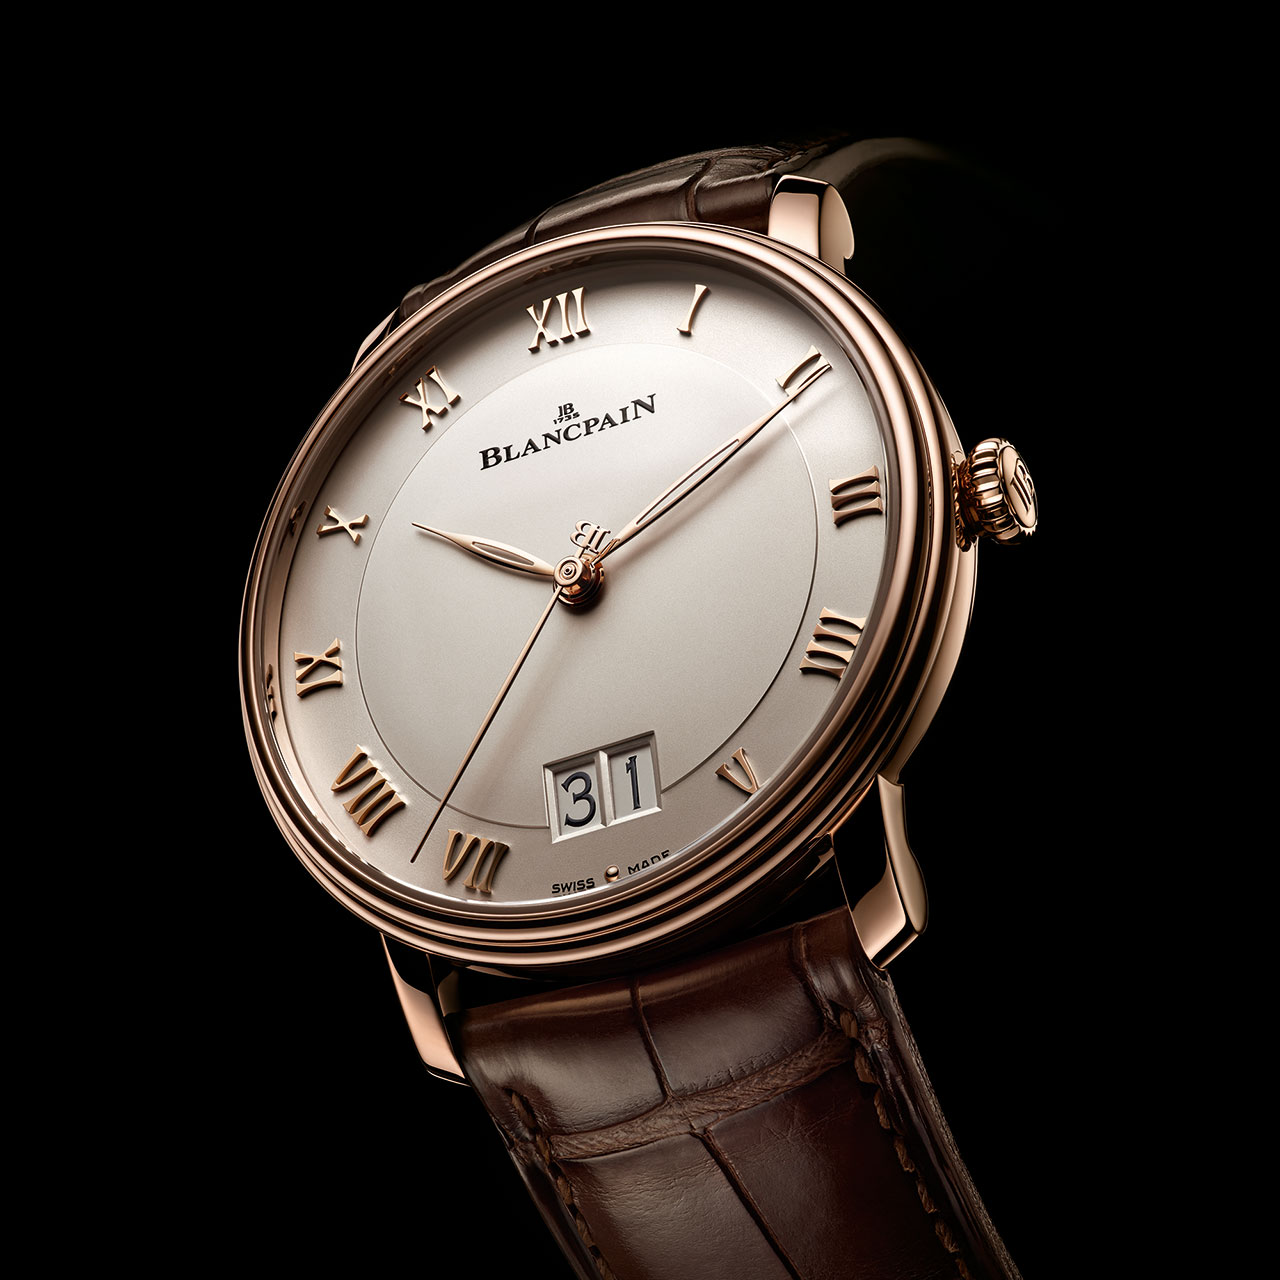 Blancpain Villeret Grande Date Mechanical Watch